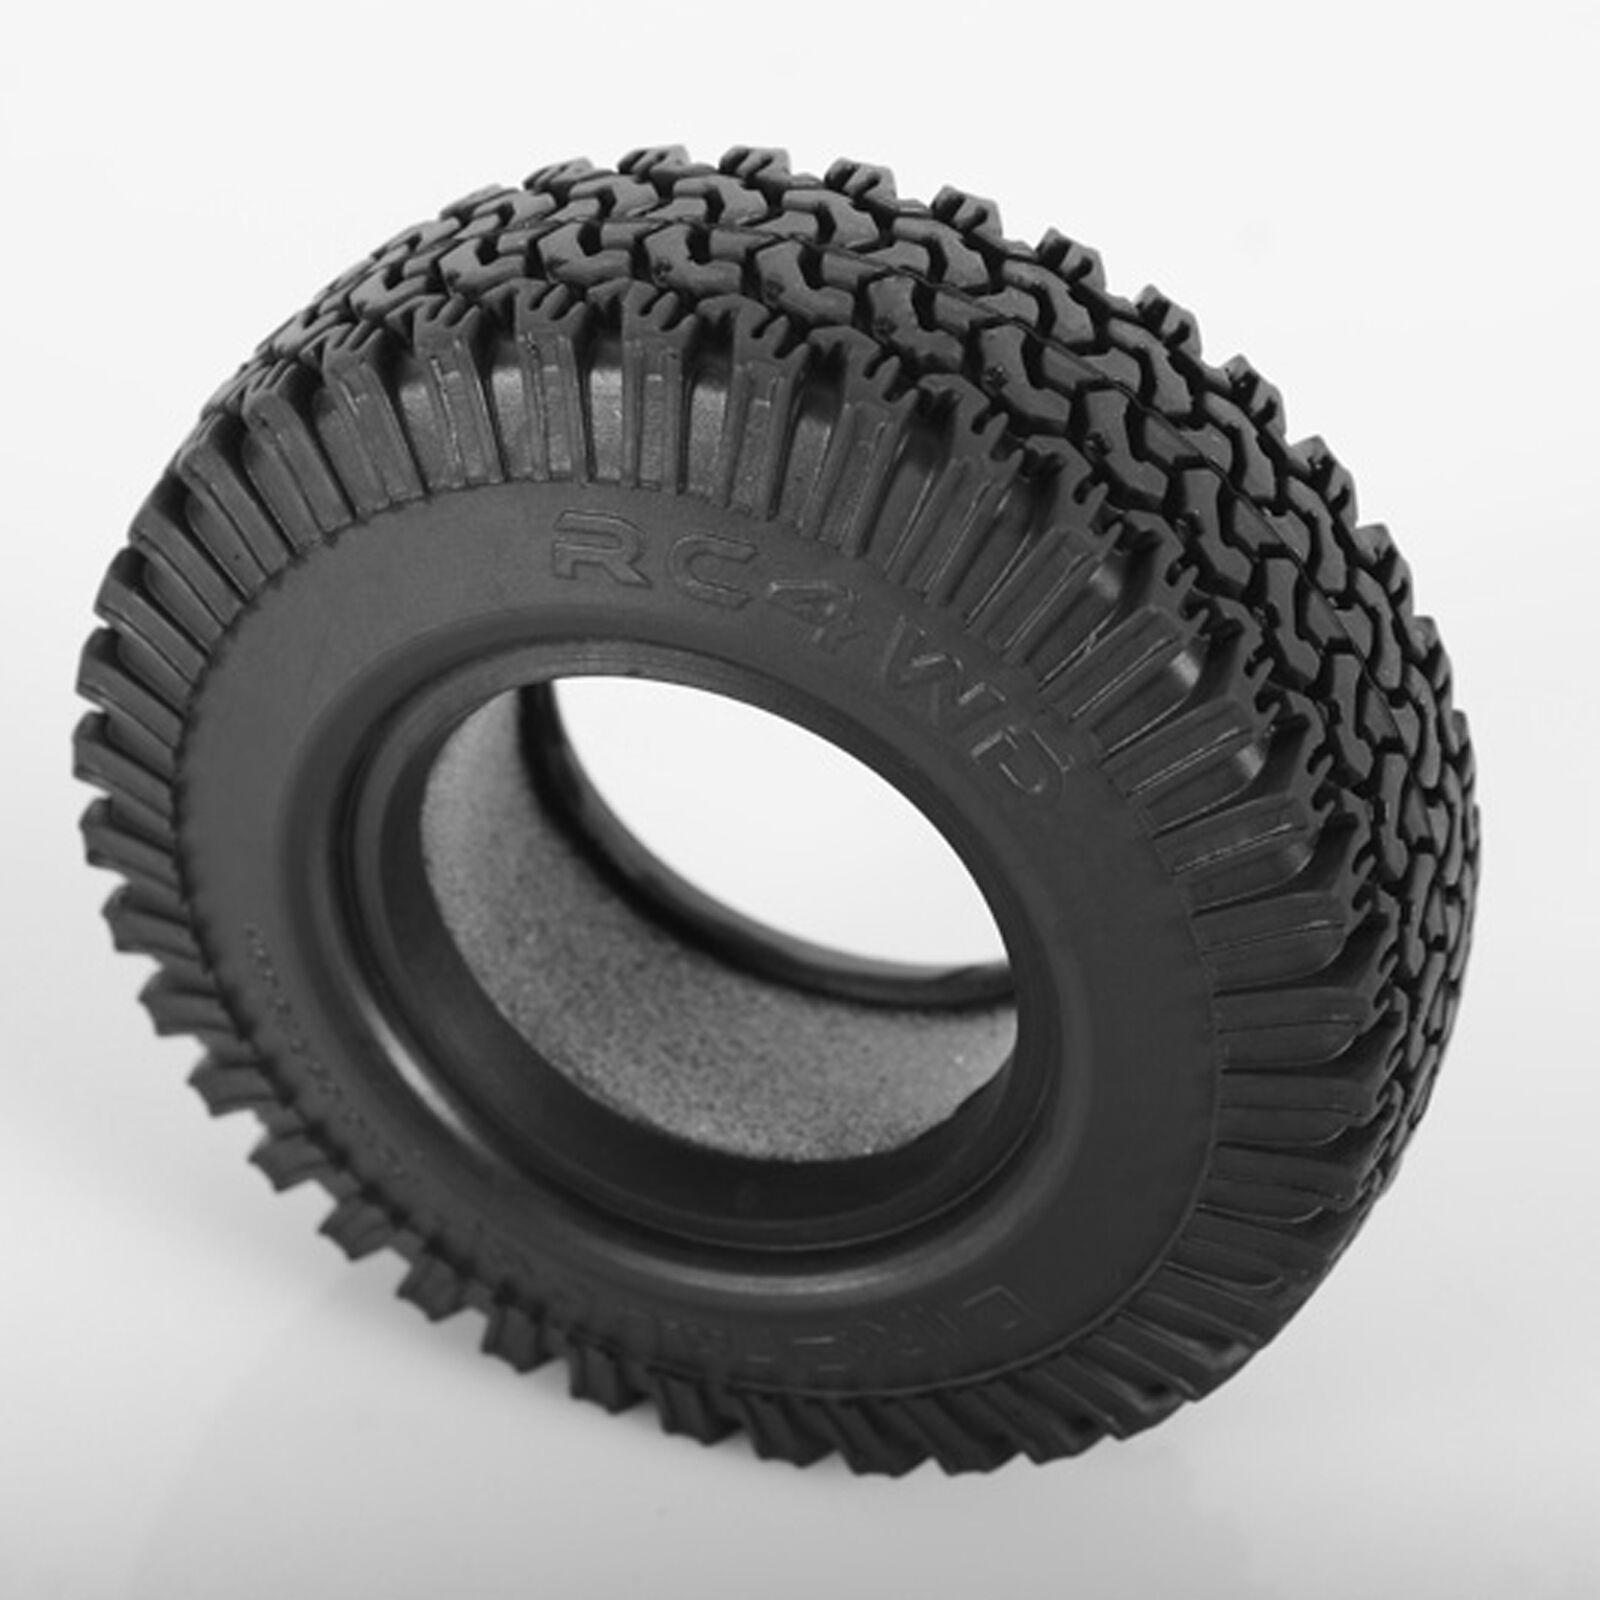 1/10 Dirt Grabber 1.9 All Terrain Crawler Tires (2)